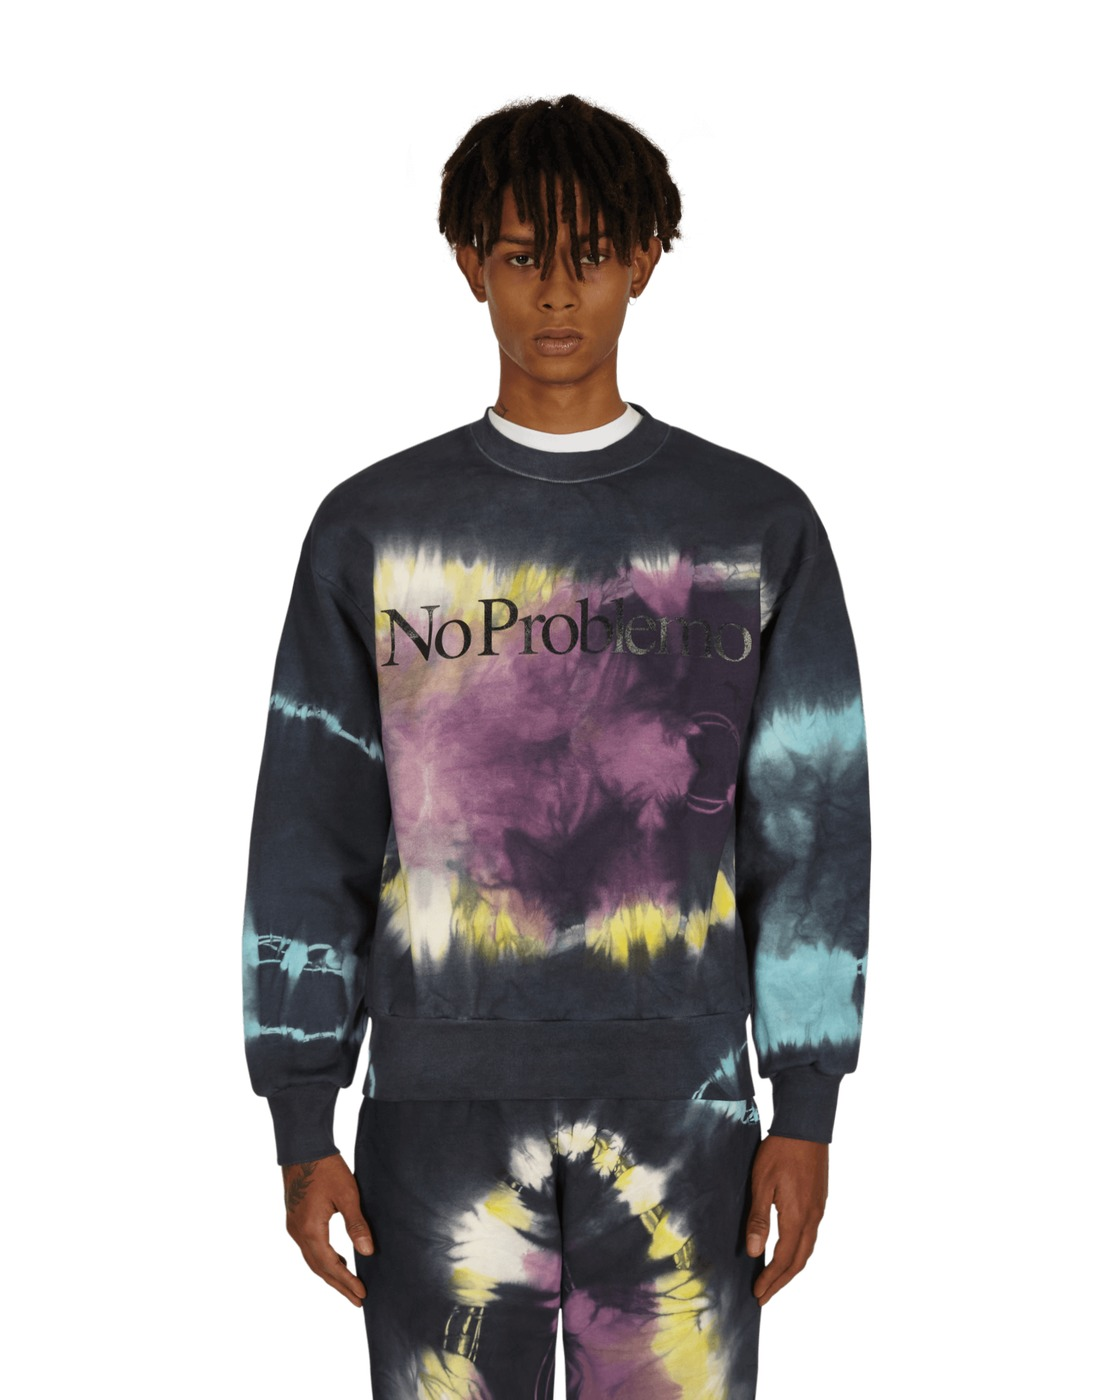 Aries No Problemo Headlights Crewneck Sweatshirt Multi